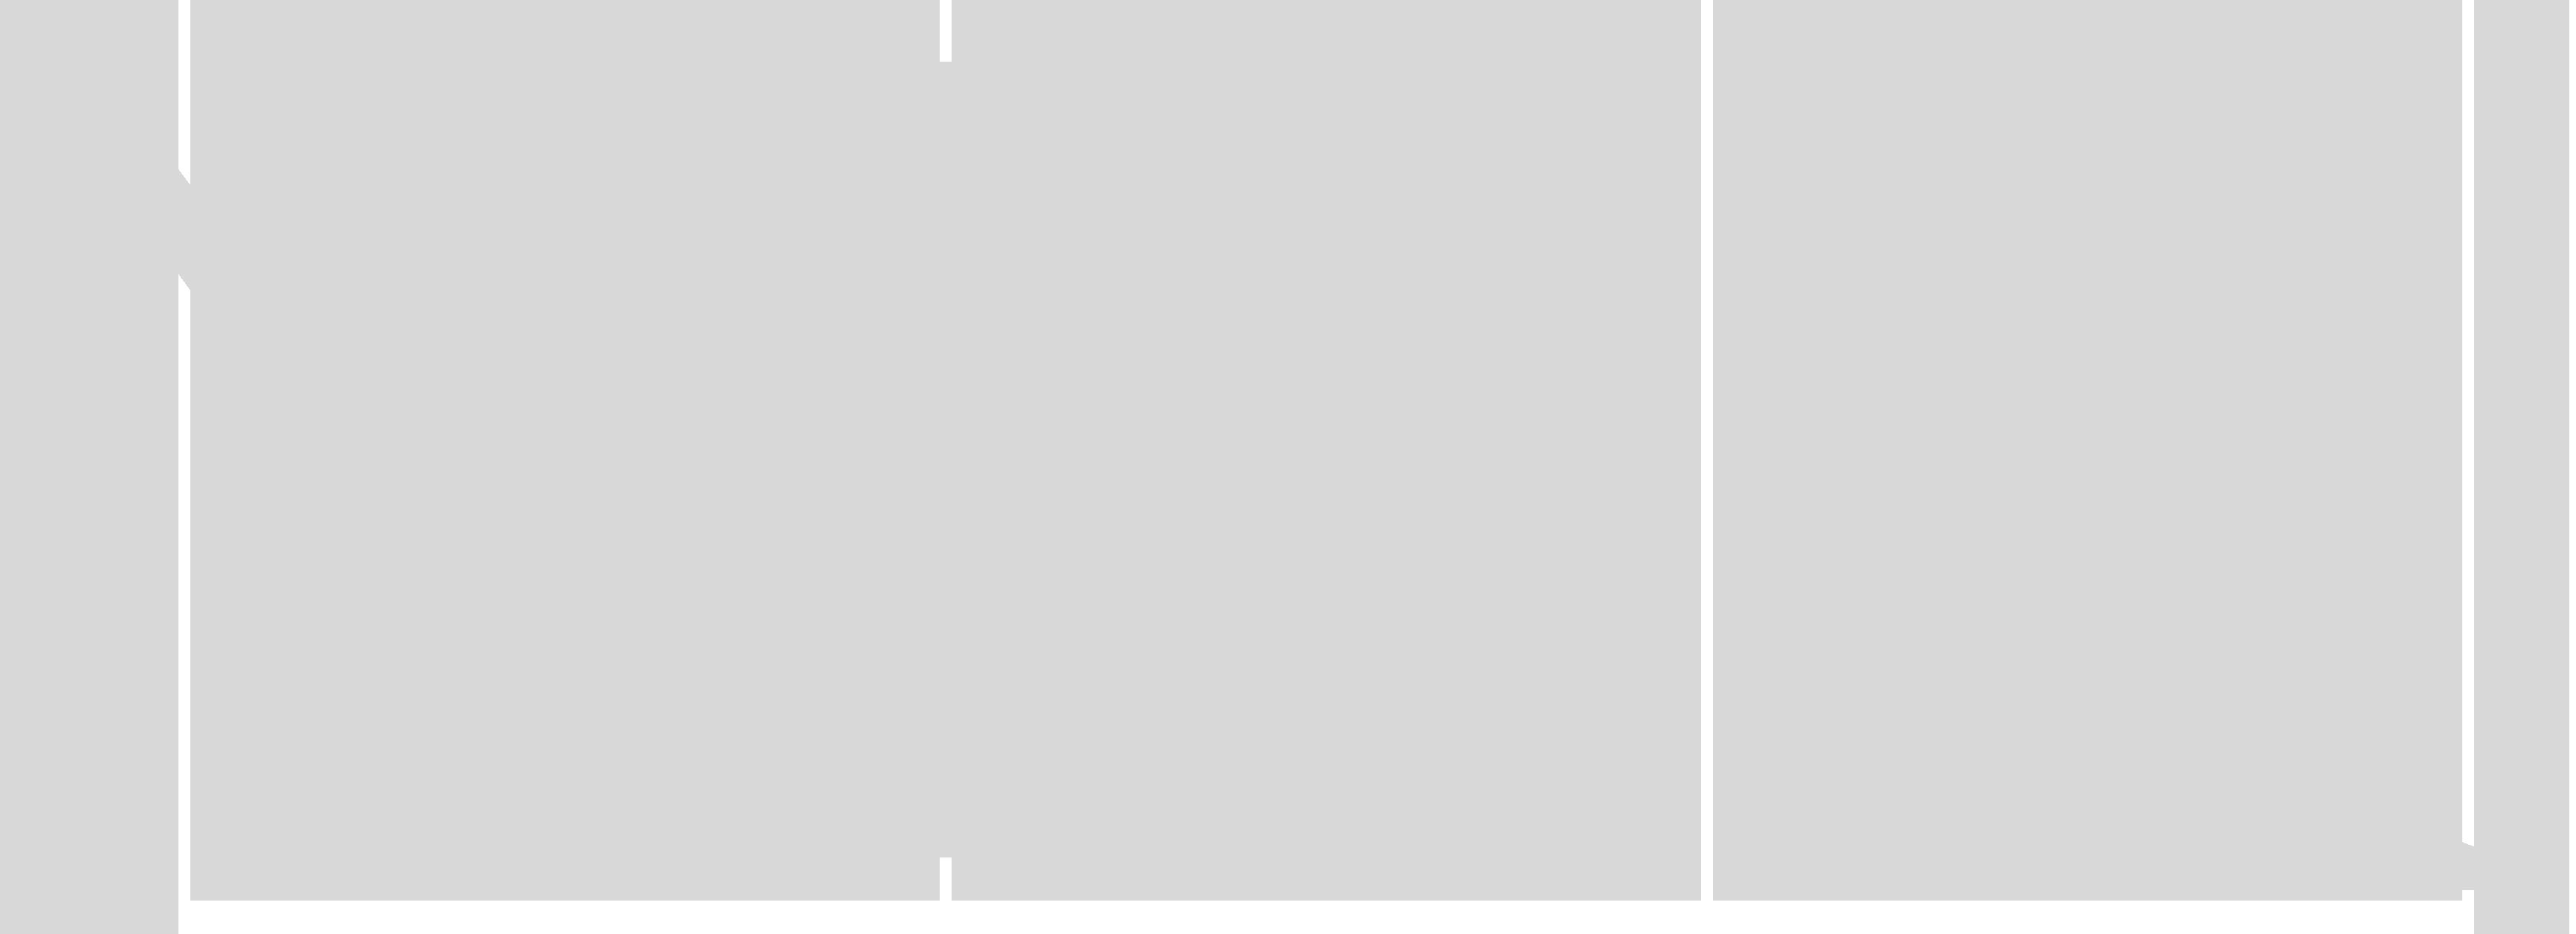 Image element